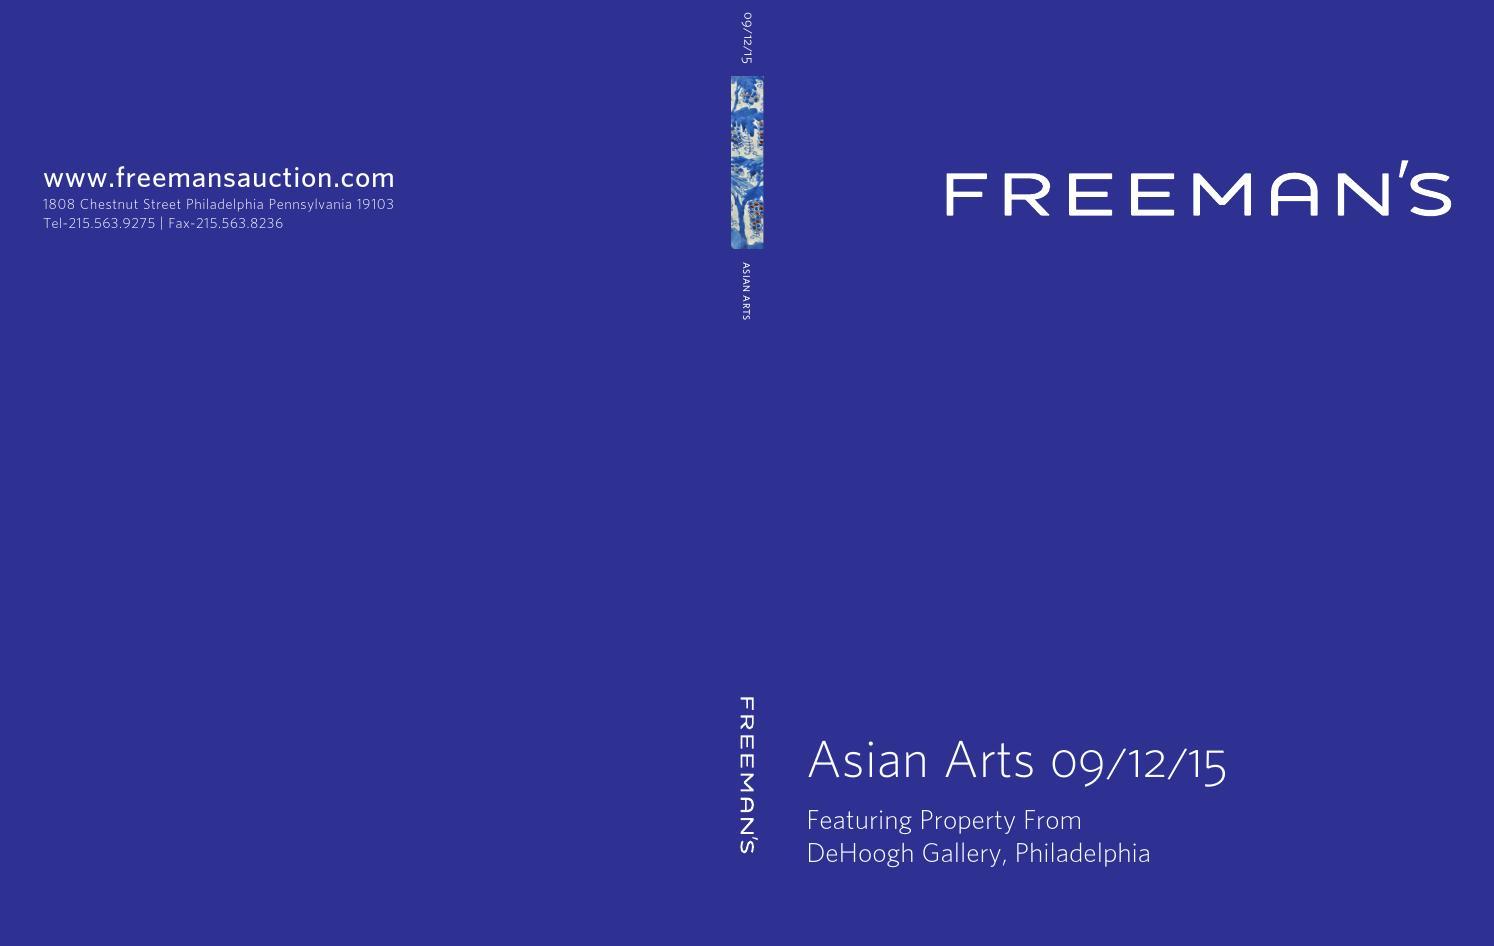 Asian Arts 09 12 15 By Freemans Issuu Miss Qian Bao Summer Surface Female Wallet